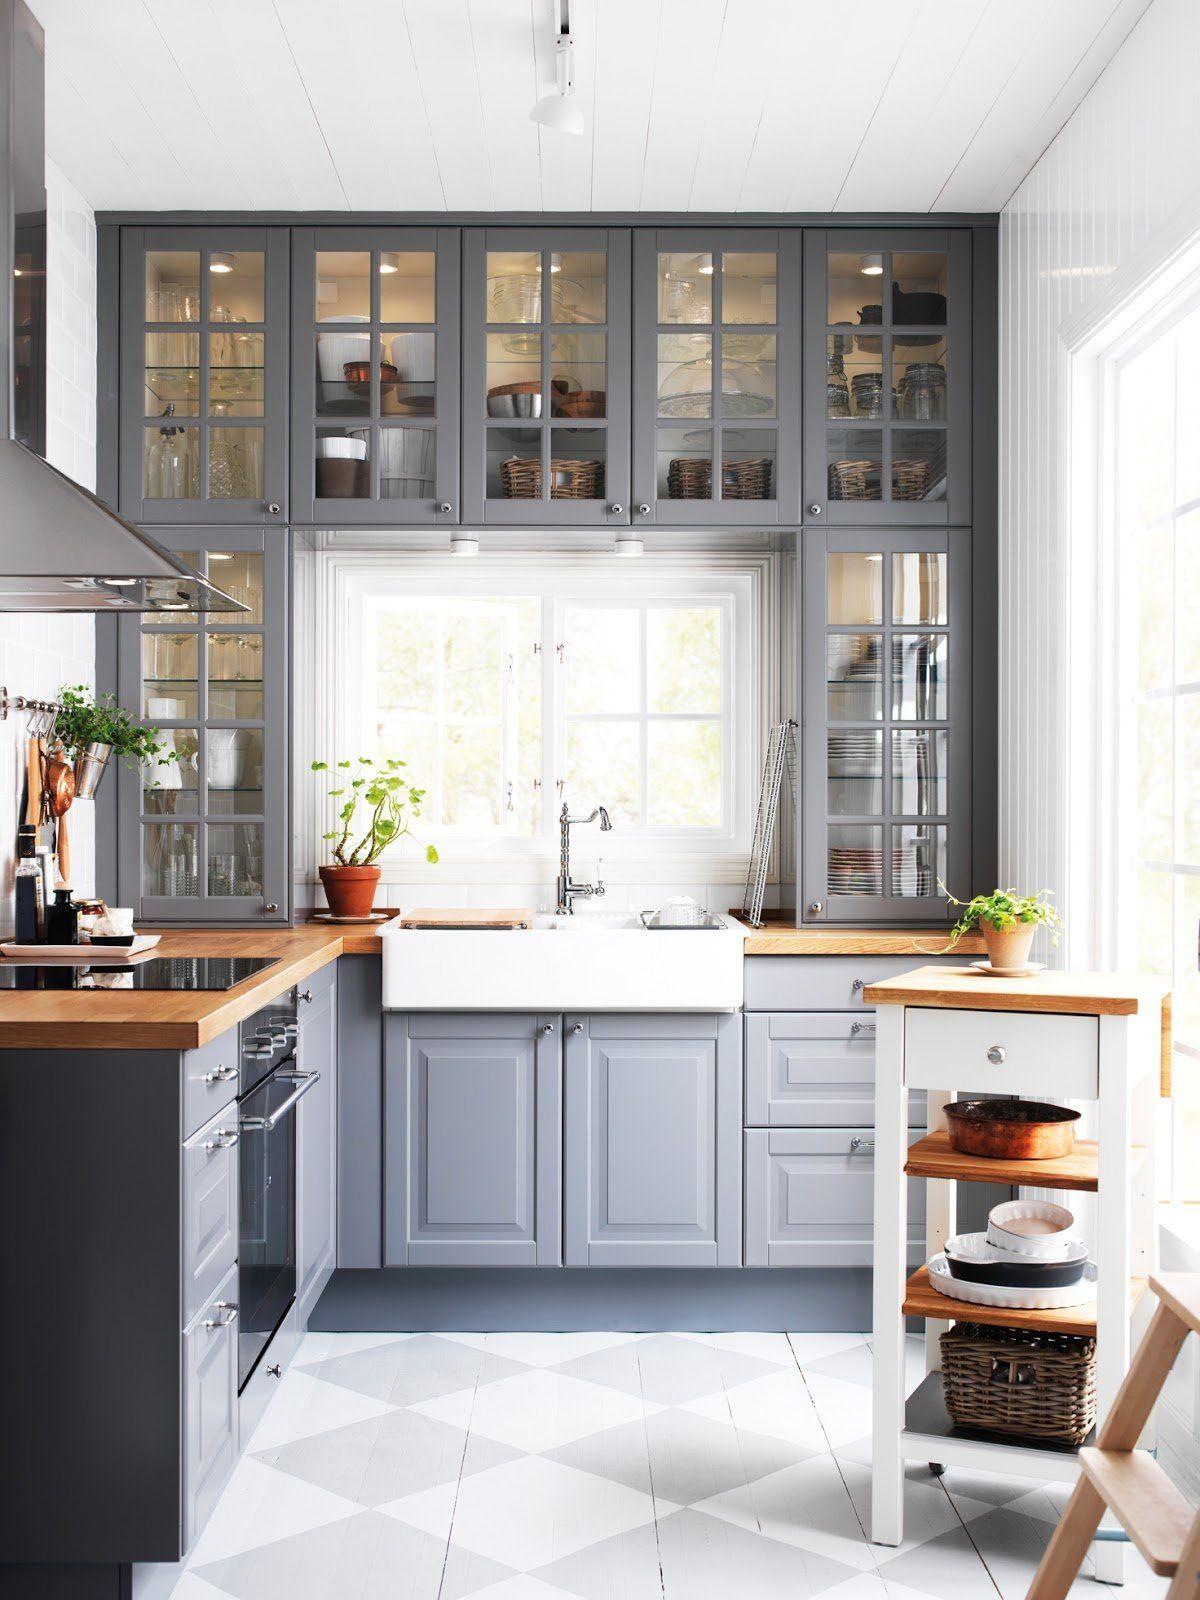 ikea küchenplanner am images der ccdaacfacdb jpg